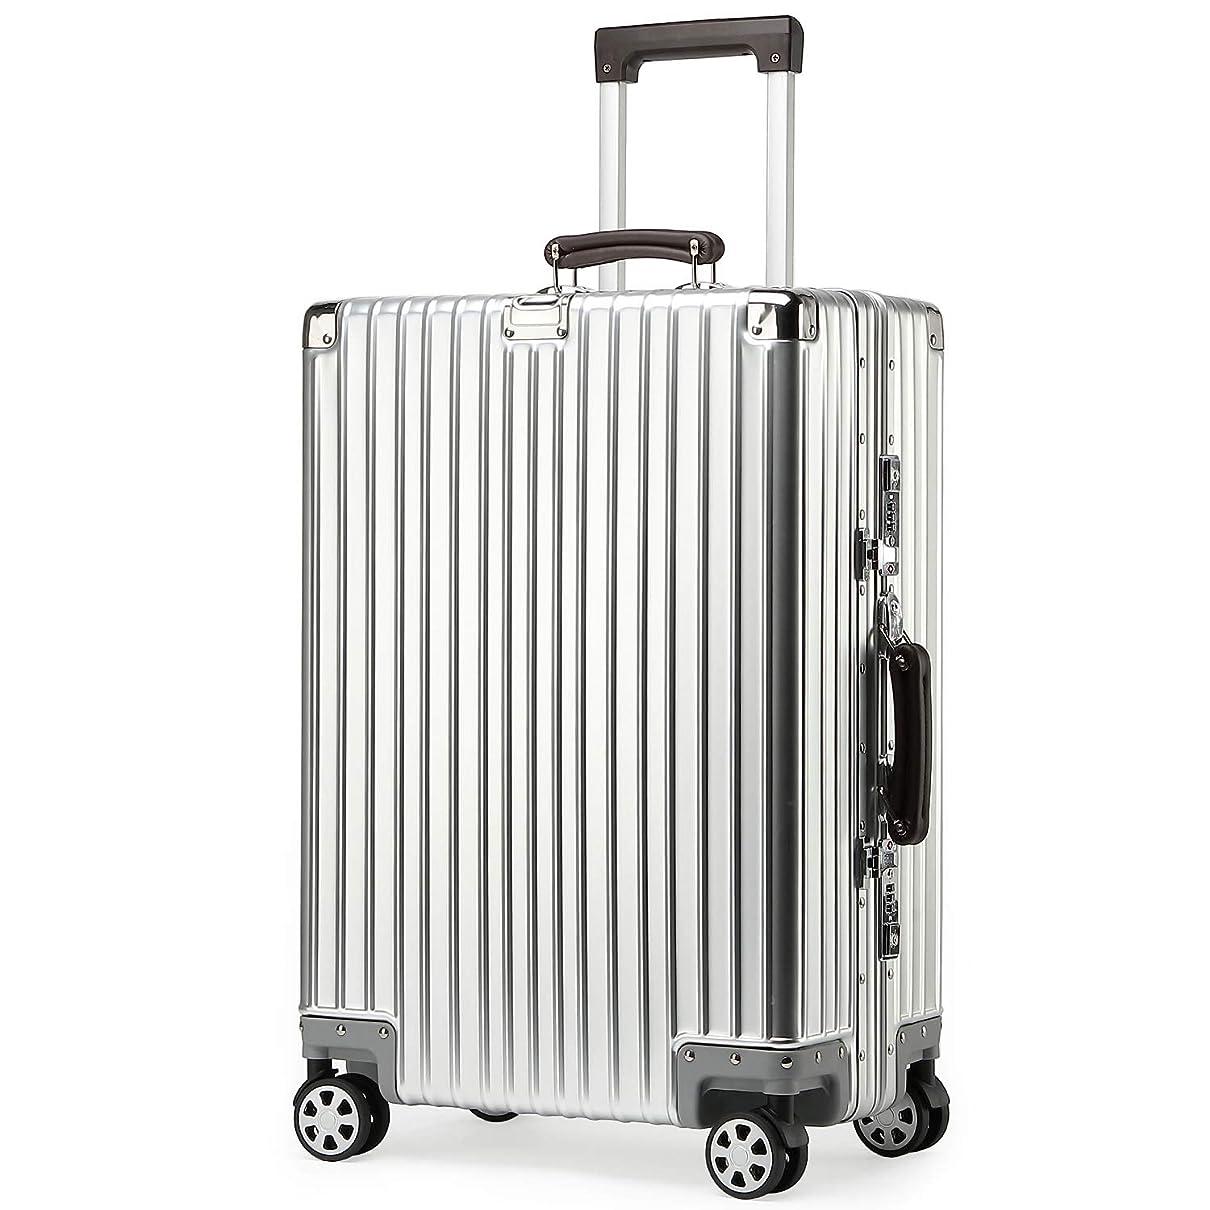 kroeus(クロース)スーツケース キャリーケース アルミ合金ボディ レザー調持ち手 復古スタイル TSAロック搭載 フレームタイプ 1年間保証サービス